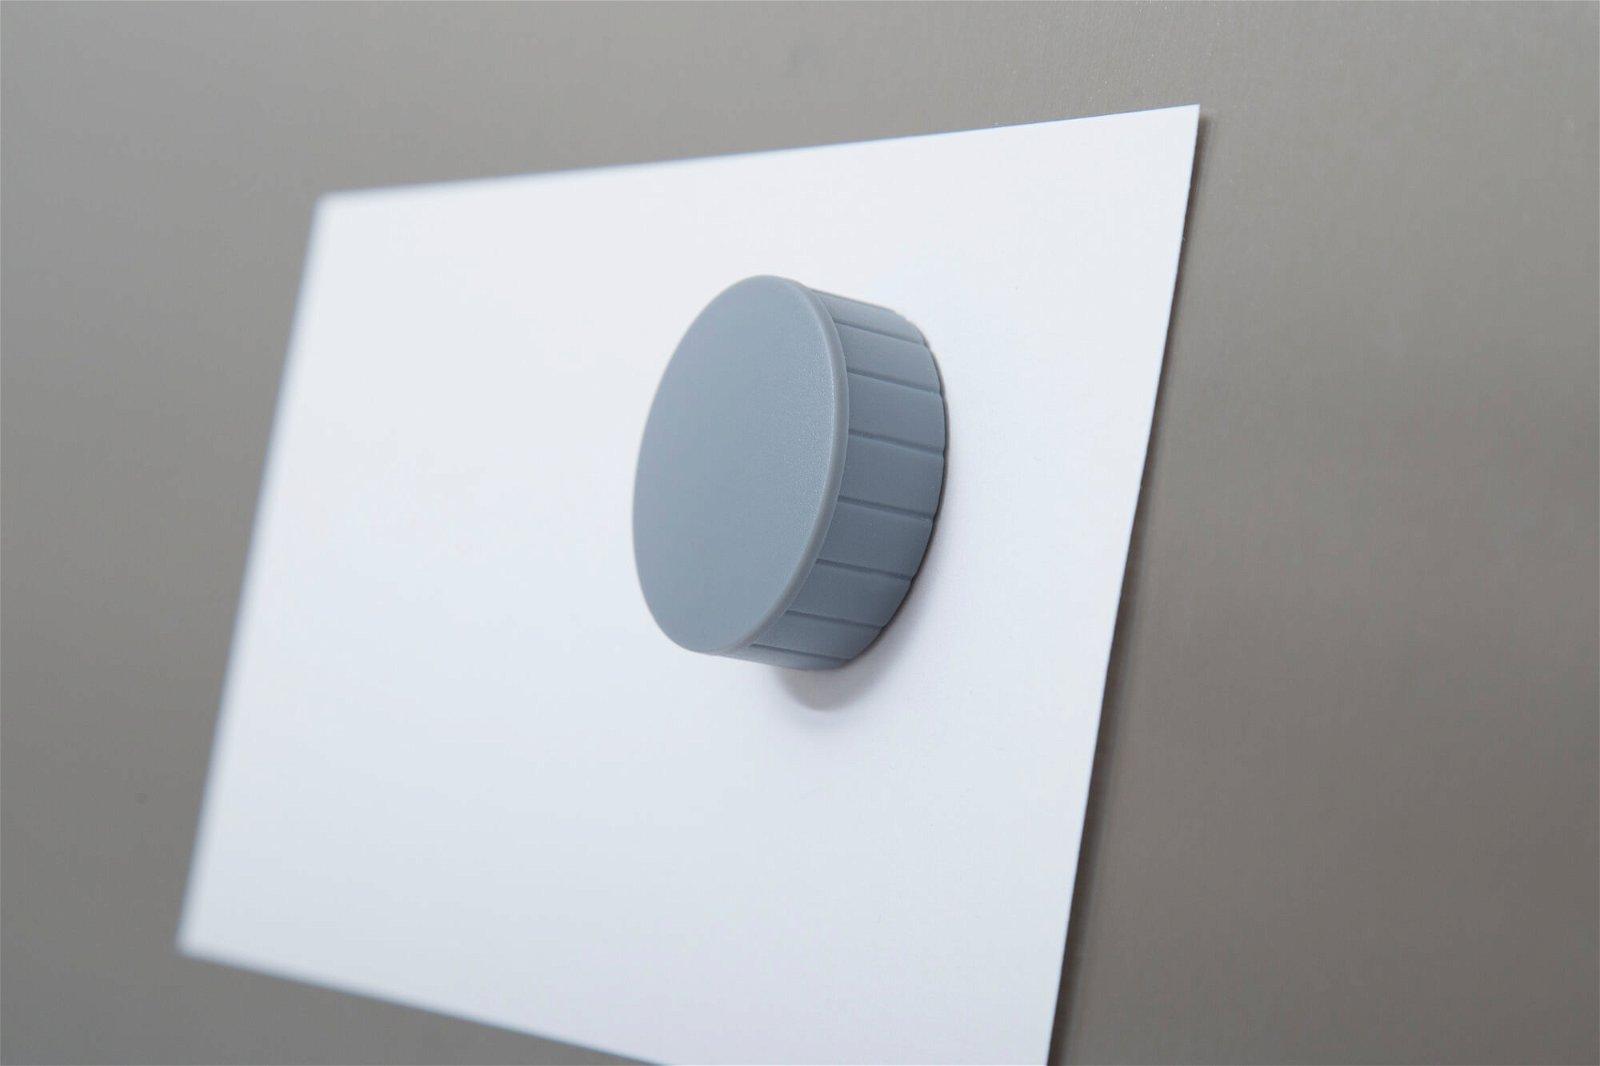 Magnet MAULsolid Ø 38 mm, 2,5 kg Haftkraft, 10 St./Ktn., grau